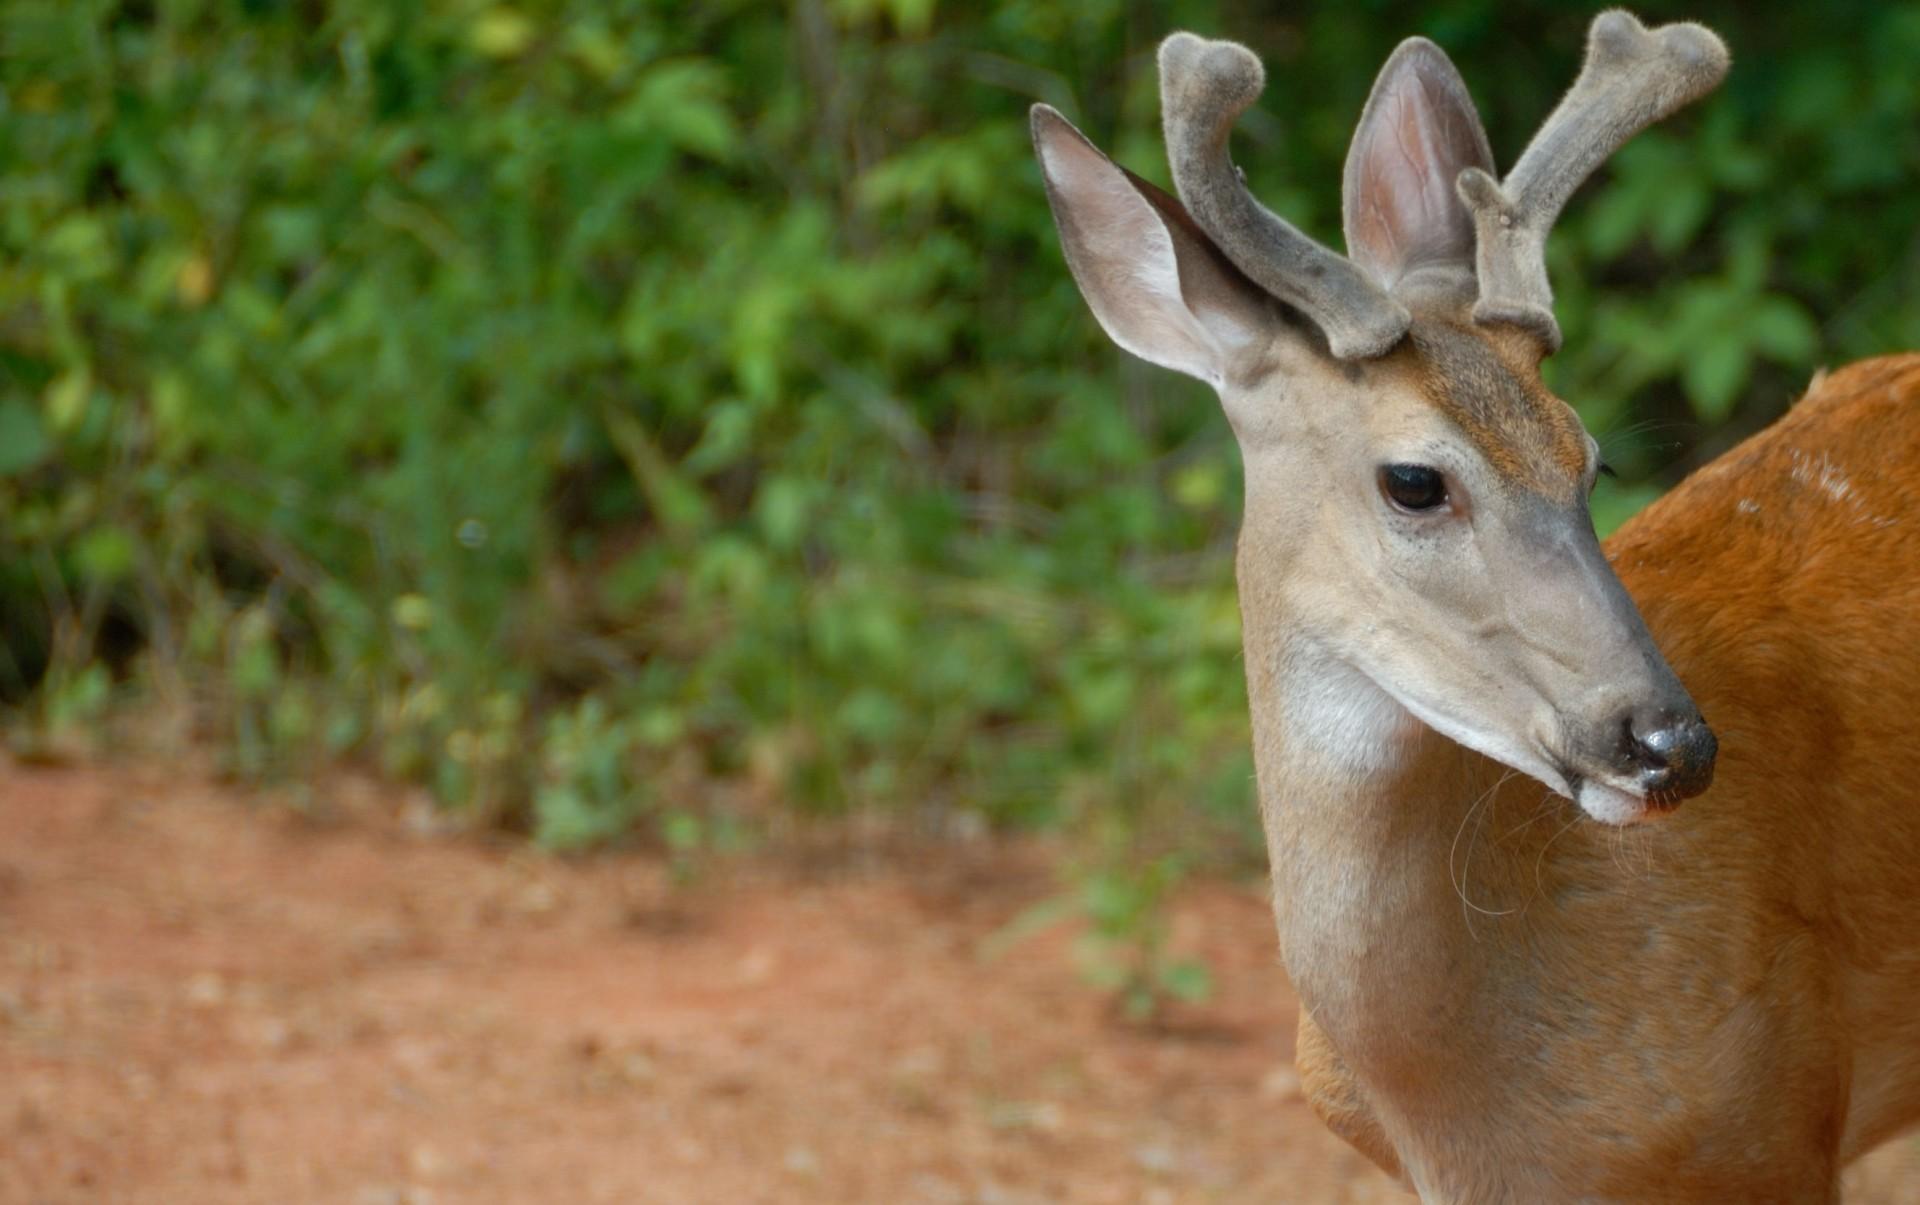 mfa feeder lights activated ip com led moultrie radius deer walmart motion w timer hog